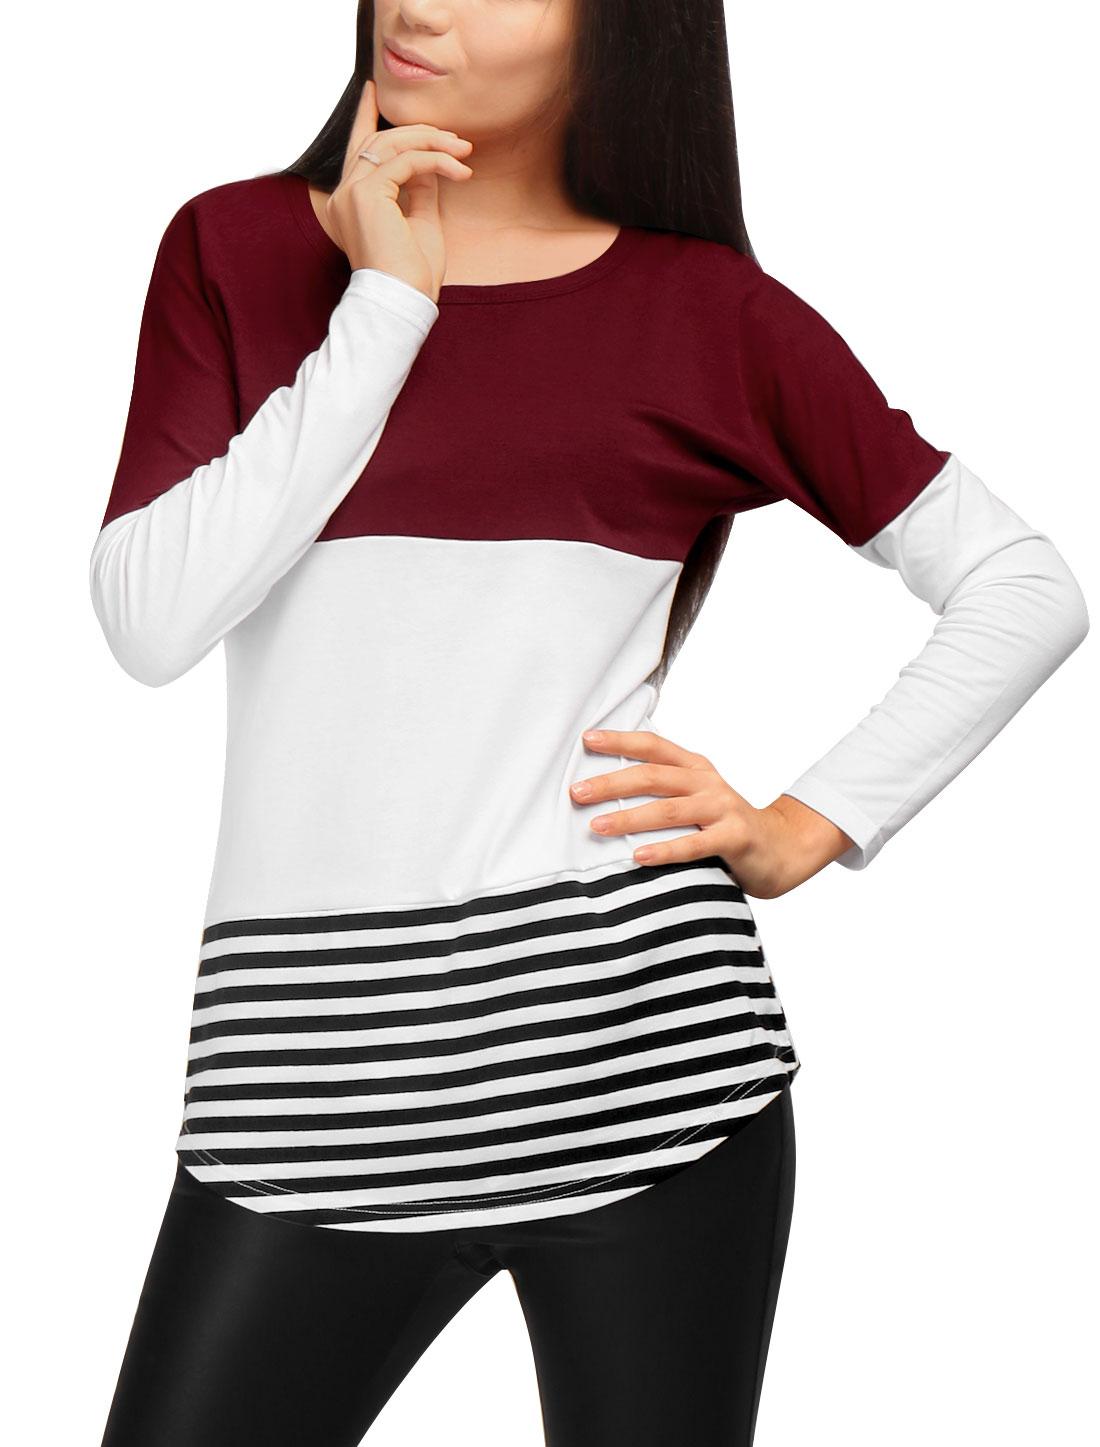 Allegra K Women Stripes Color Block Curved Hem Paneled Tunic Shirt Red L